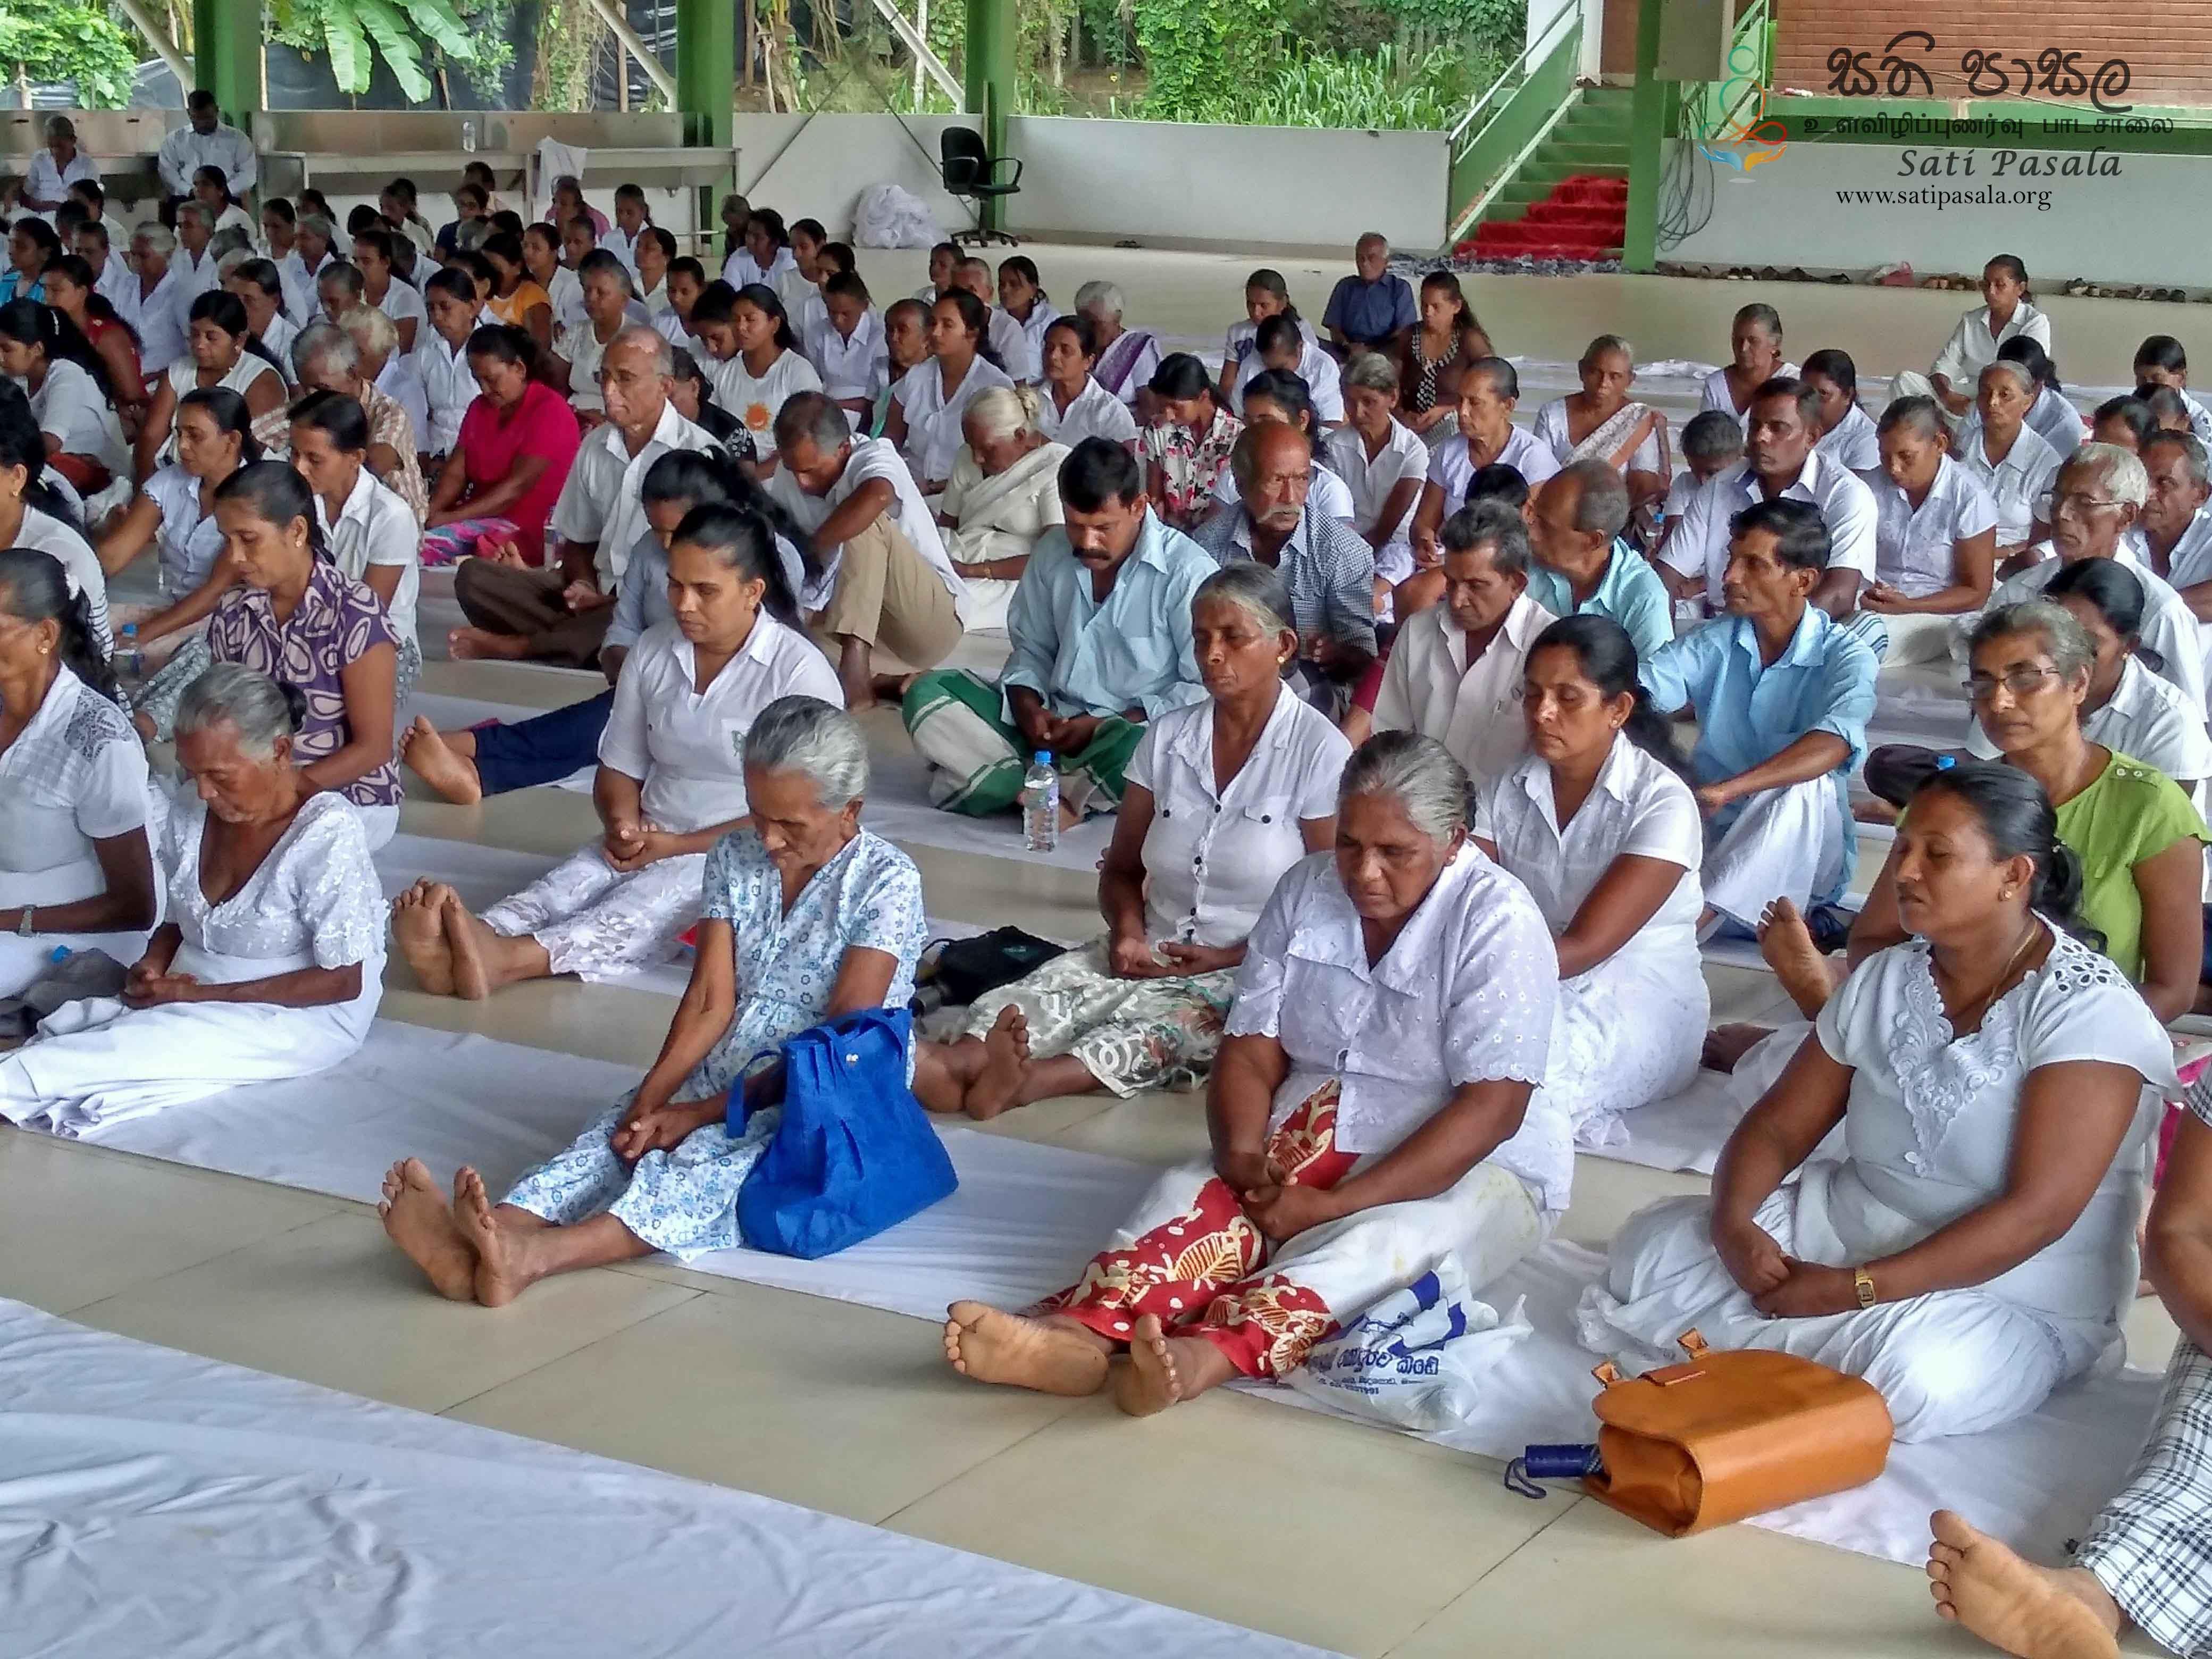 Sati Pasala Mindfulness Programmes at Miami Clothing (Pvt) Ltd